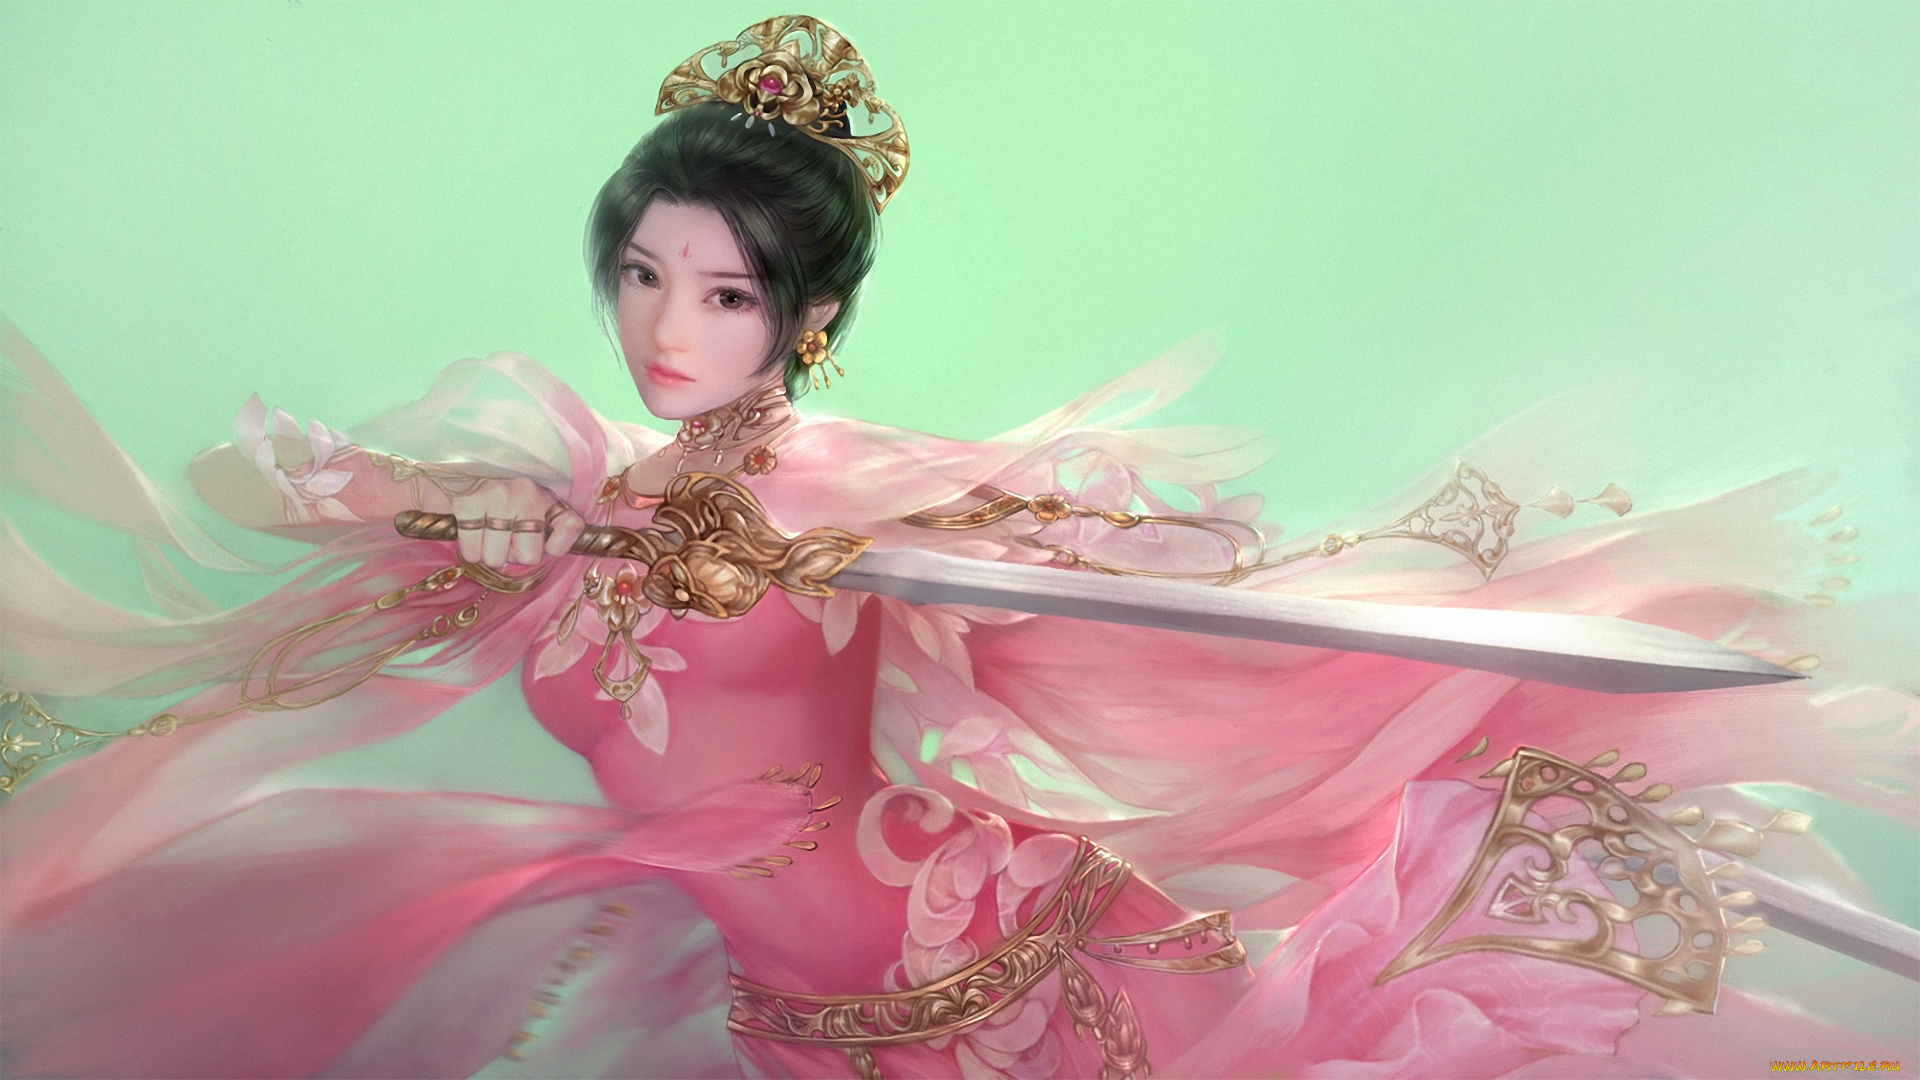 teen-asian-phoenix-girl